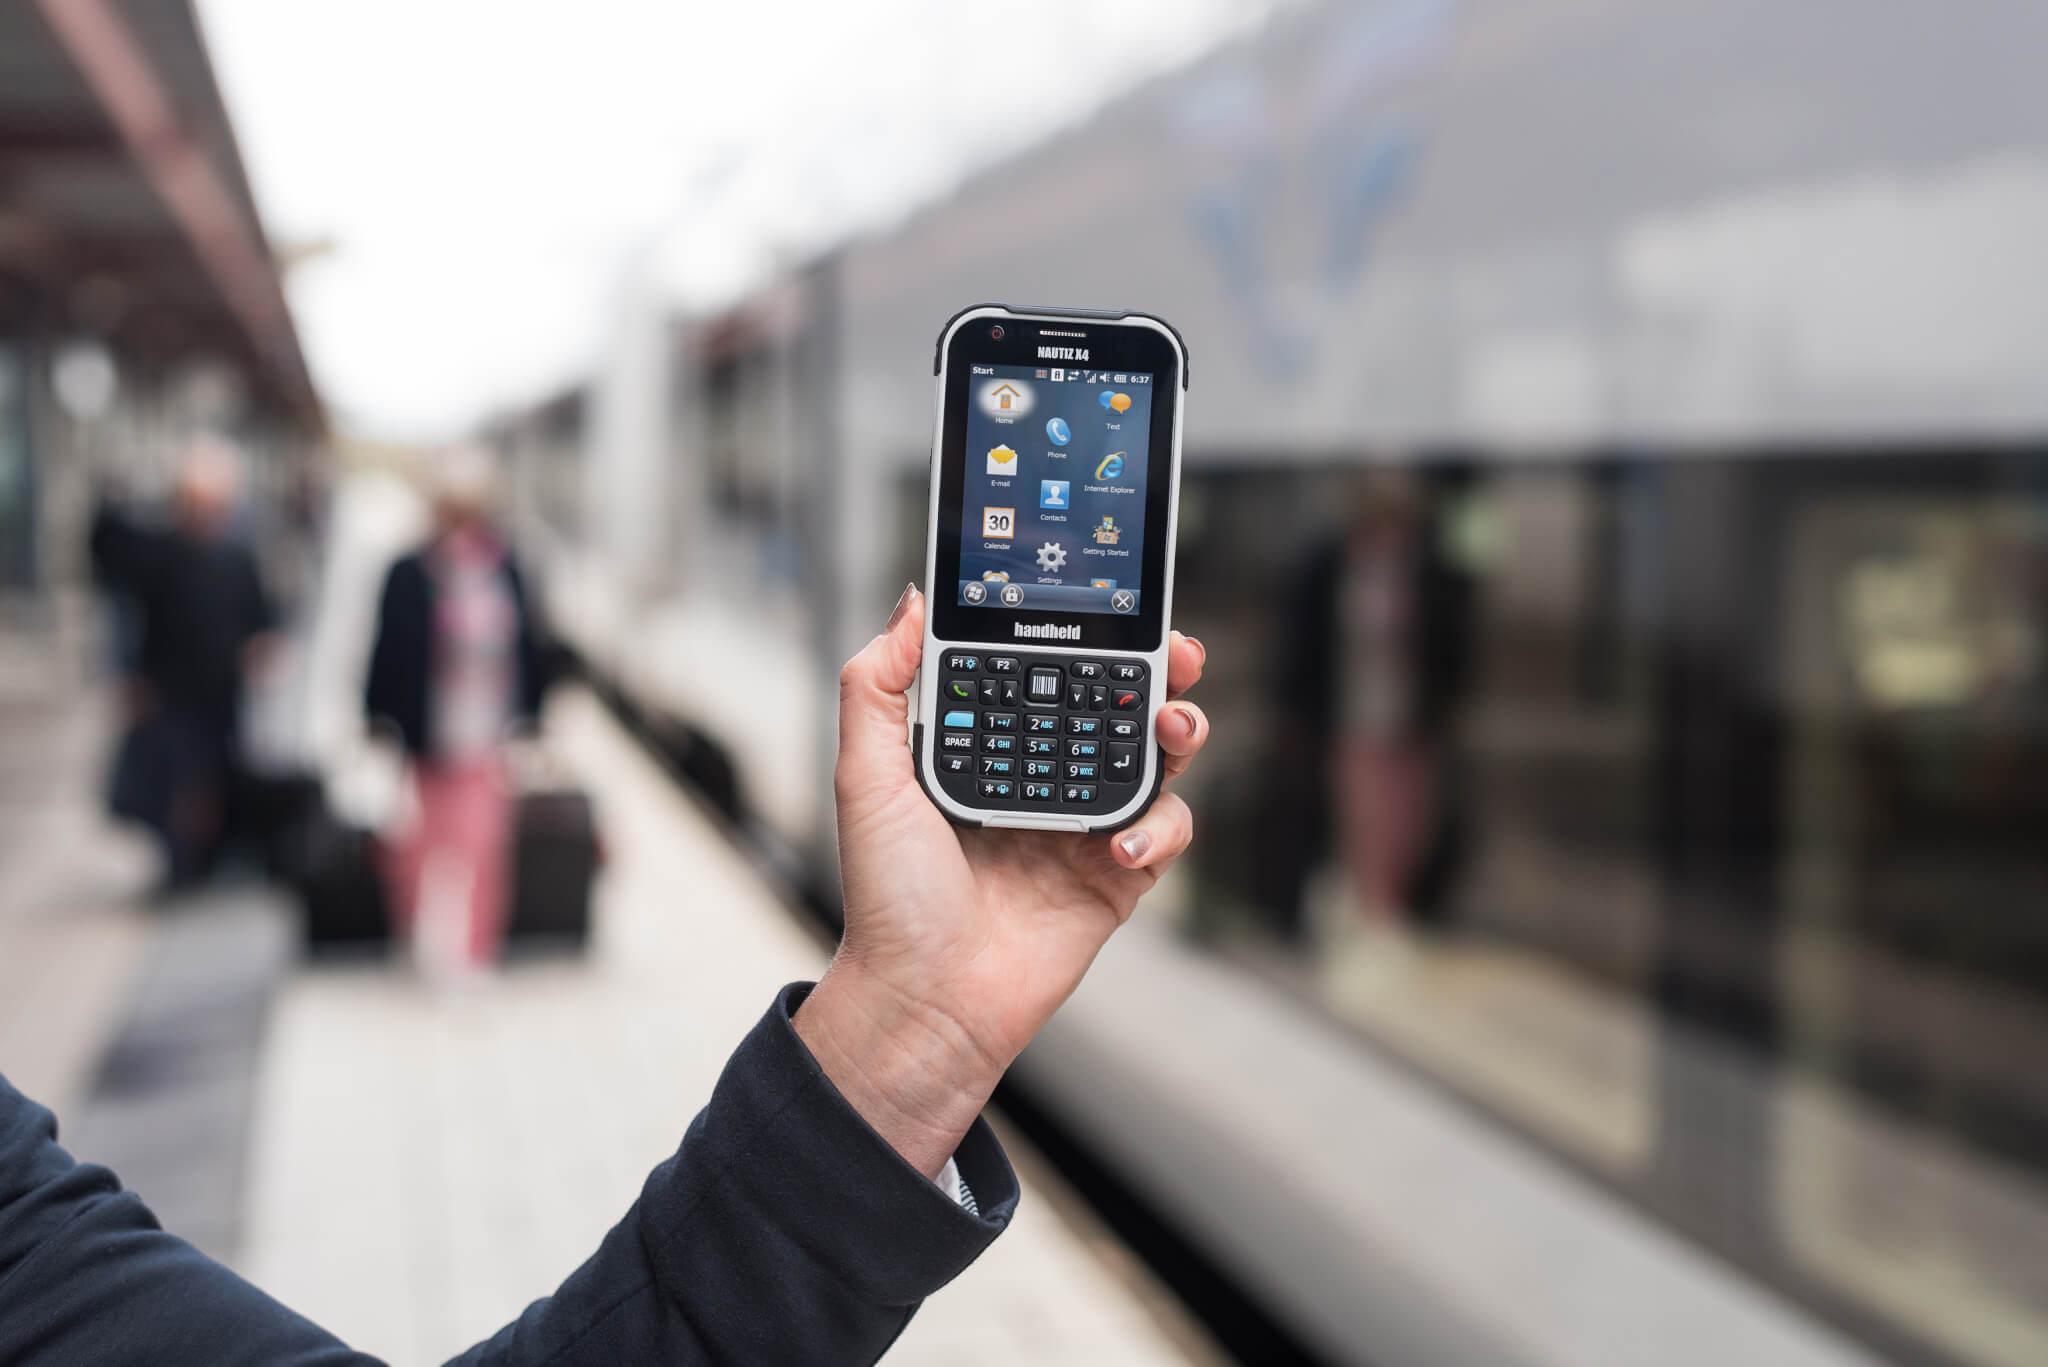 Nautiz X4 eTicket Pro II for Public Transport